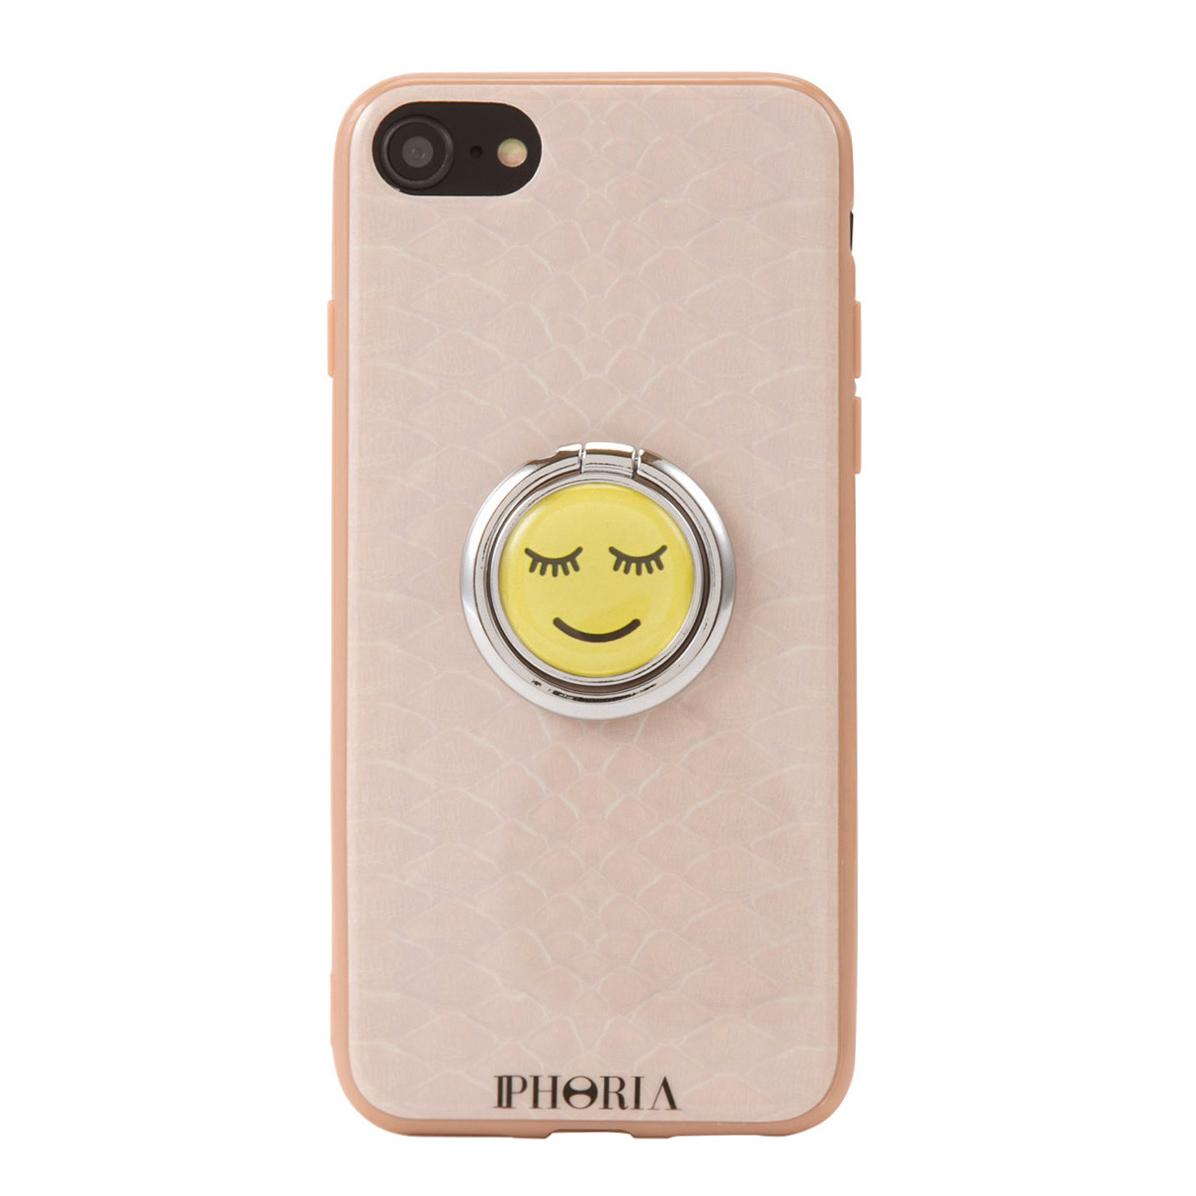 IPHORIA アイフォリア Case for Apple iPhone 7/8 - Ring Happy Beige Snake リングハッピーベージュスネーク 海外ブランド オシャレ 人気